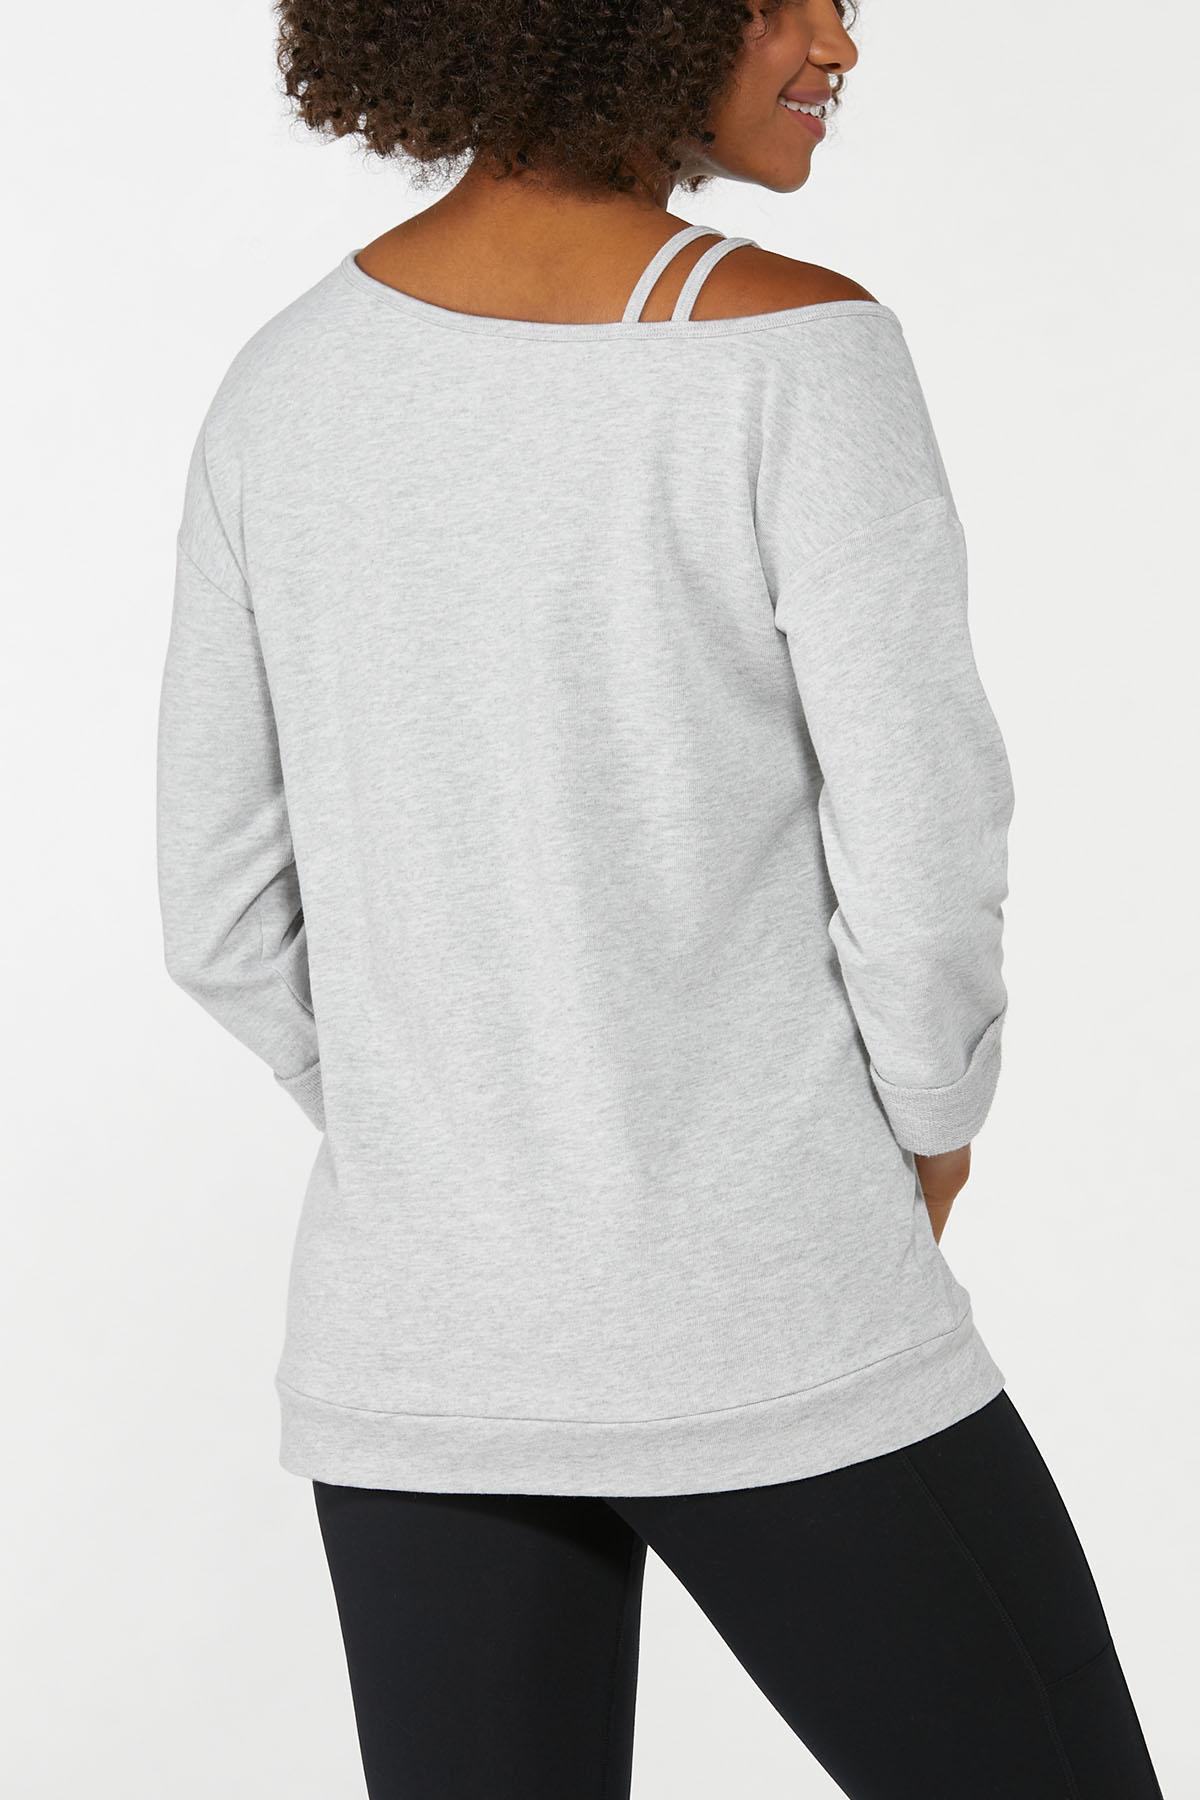 Gray Strappy Shoulder Sweatshirt (Item #44668480)